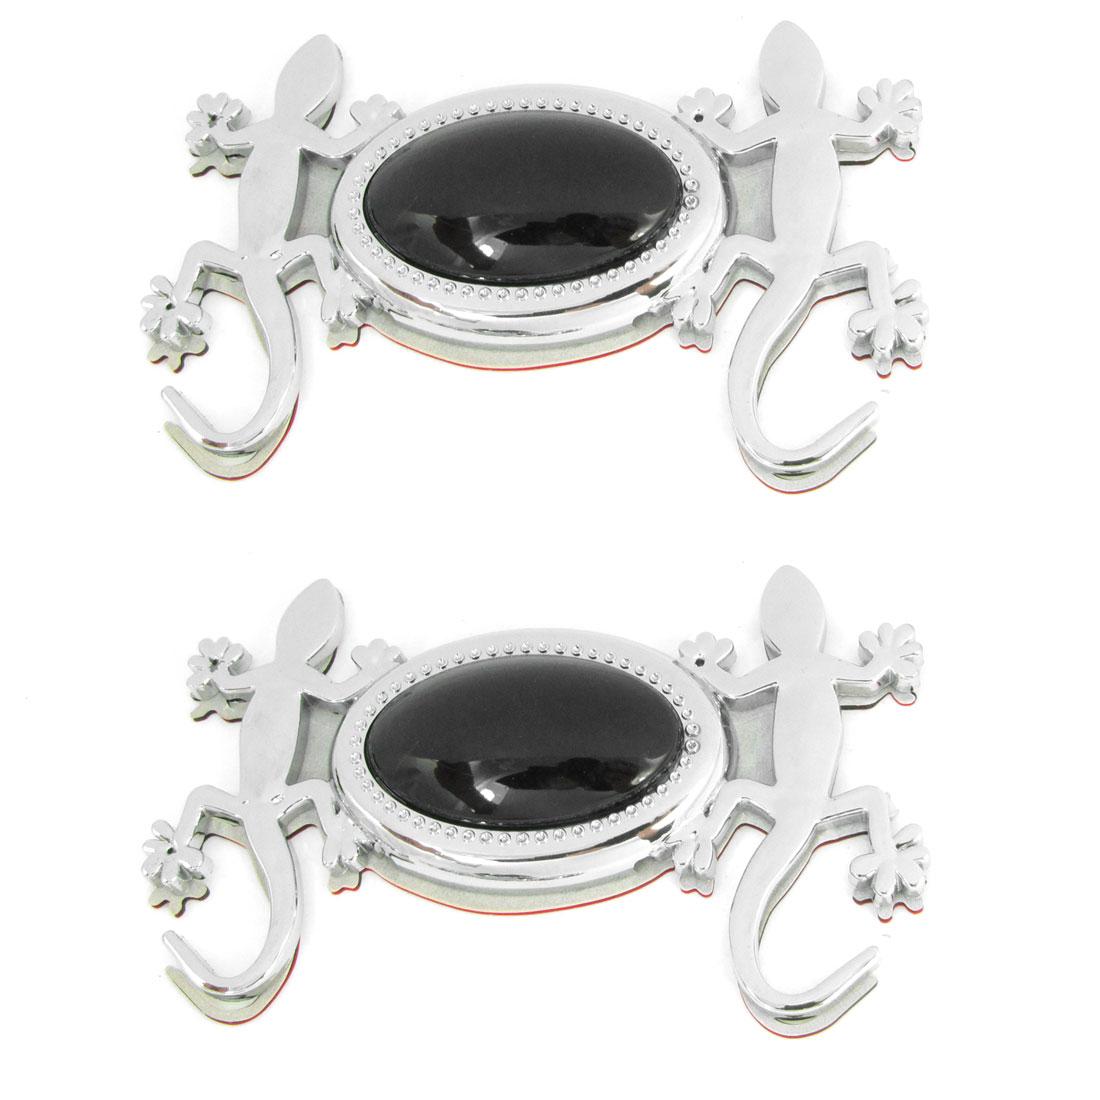 2 Pcs Auto Car Silver Tone Black Gecko Designed Bumper Decorative 3D Sticker